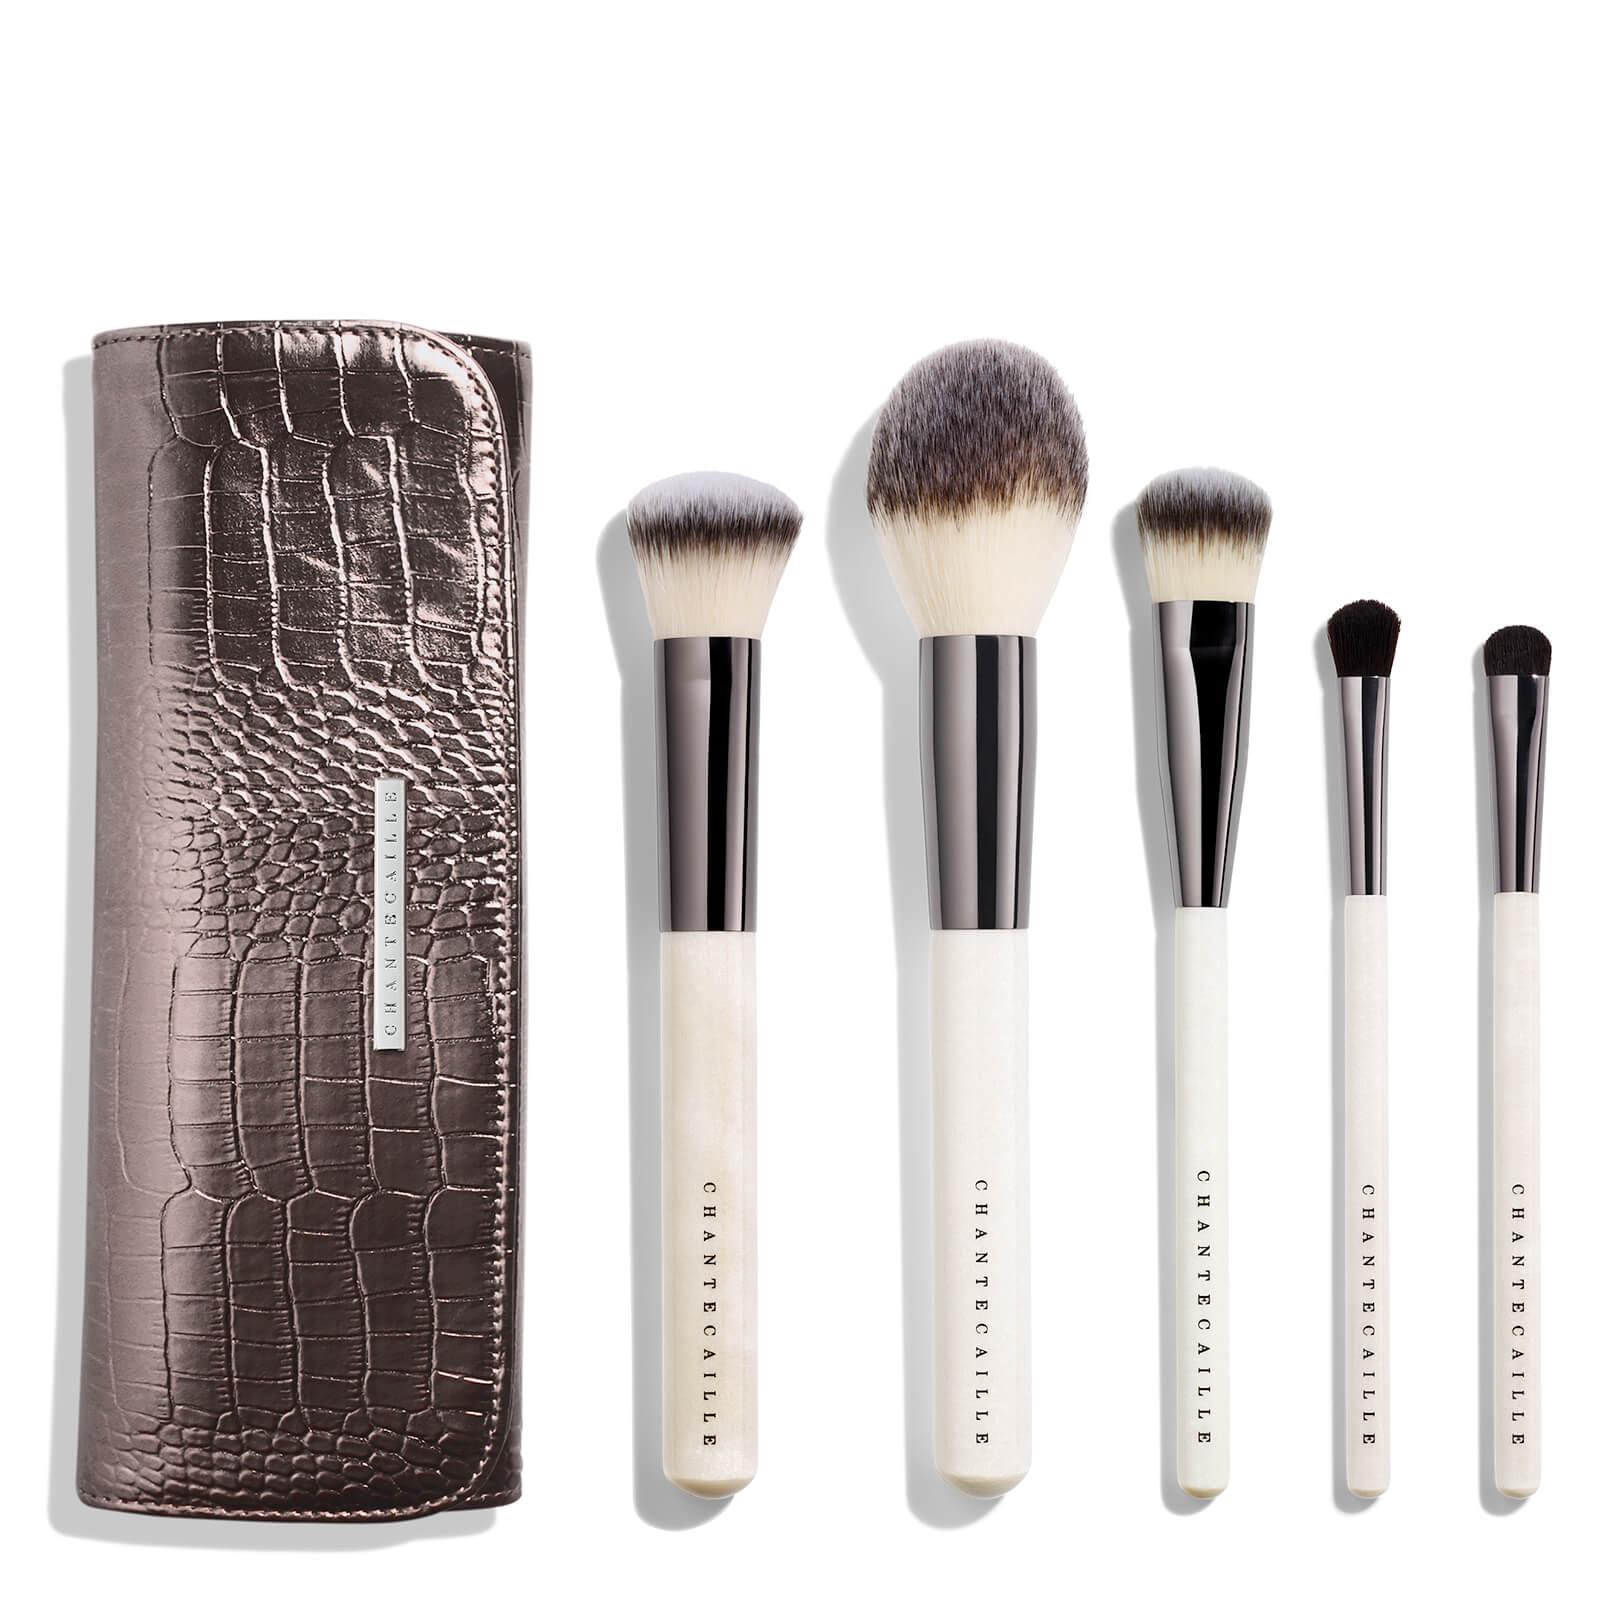 Chantecaille Deluxe Brush Collection Beautyexpert Mama Lime 800 Ml Product Description